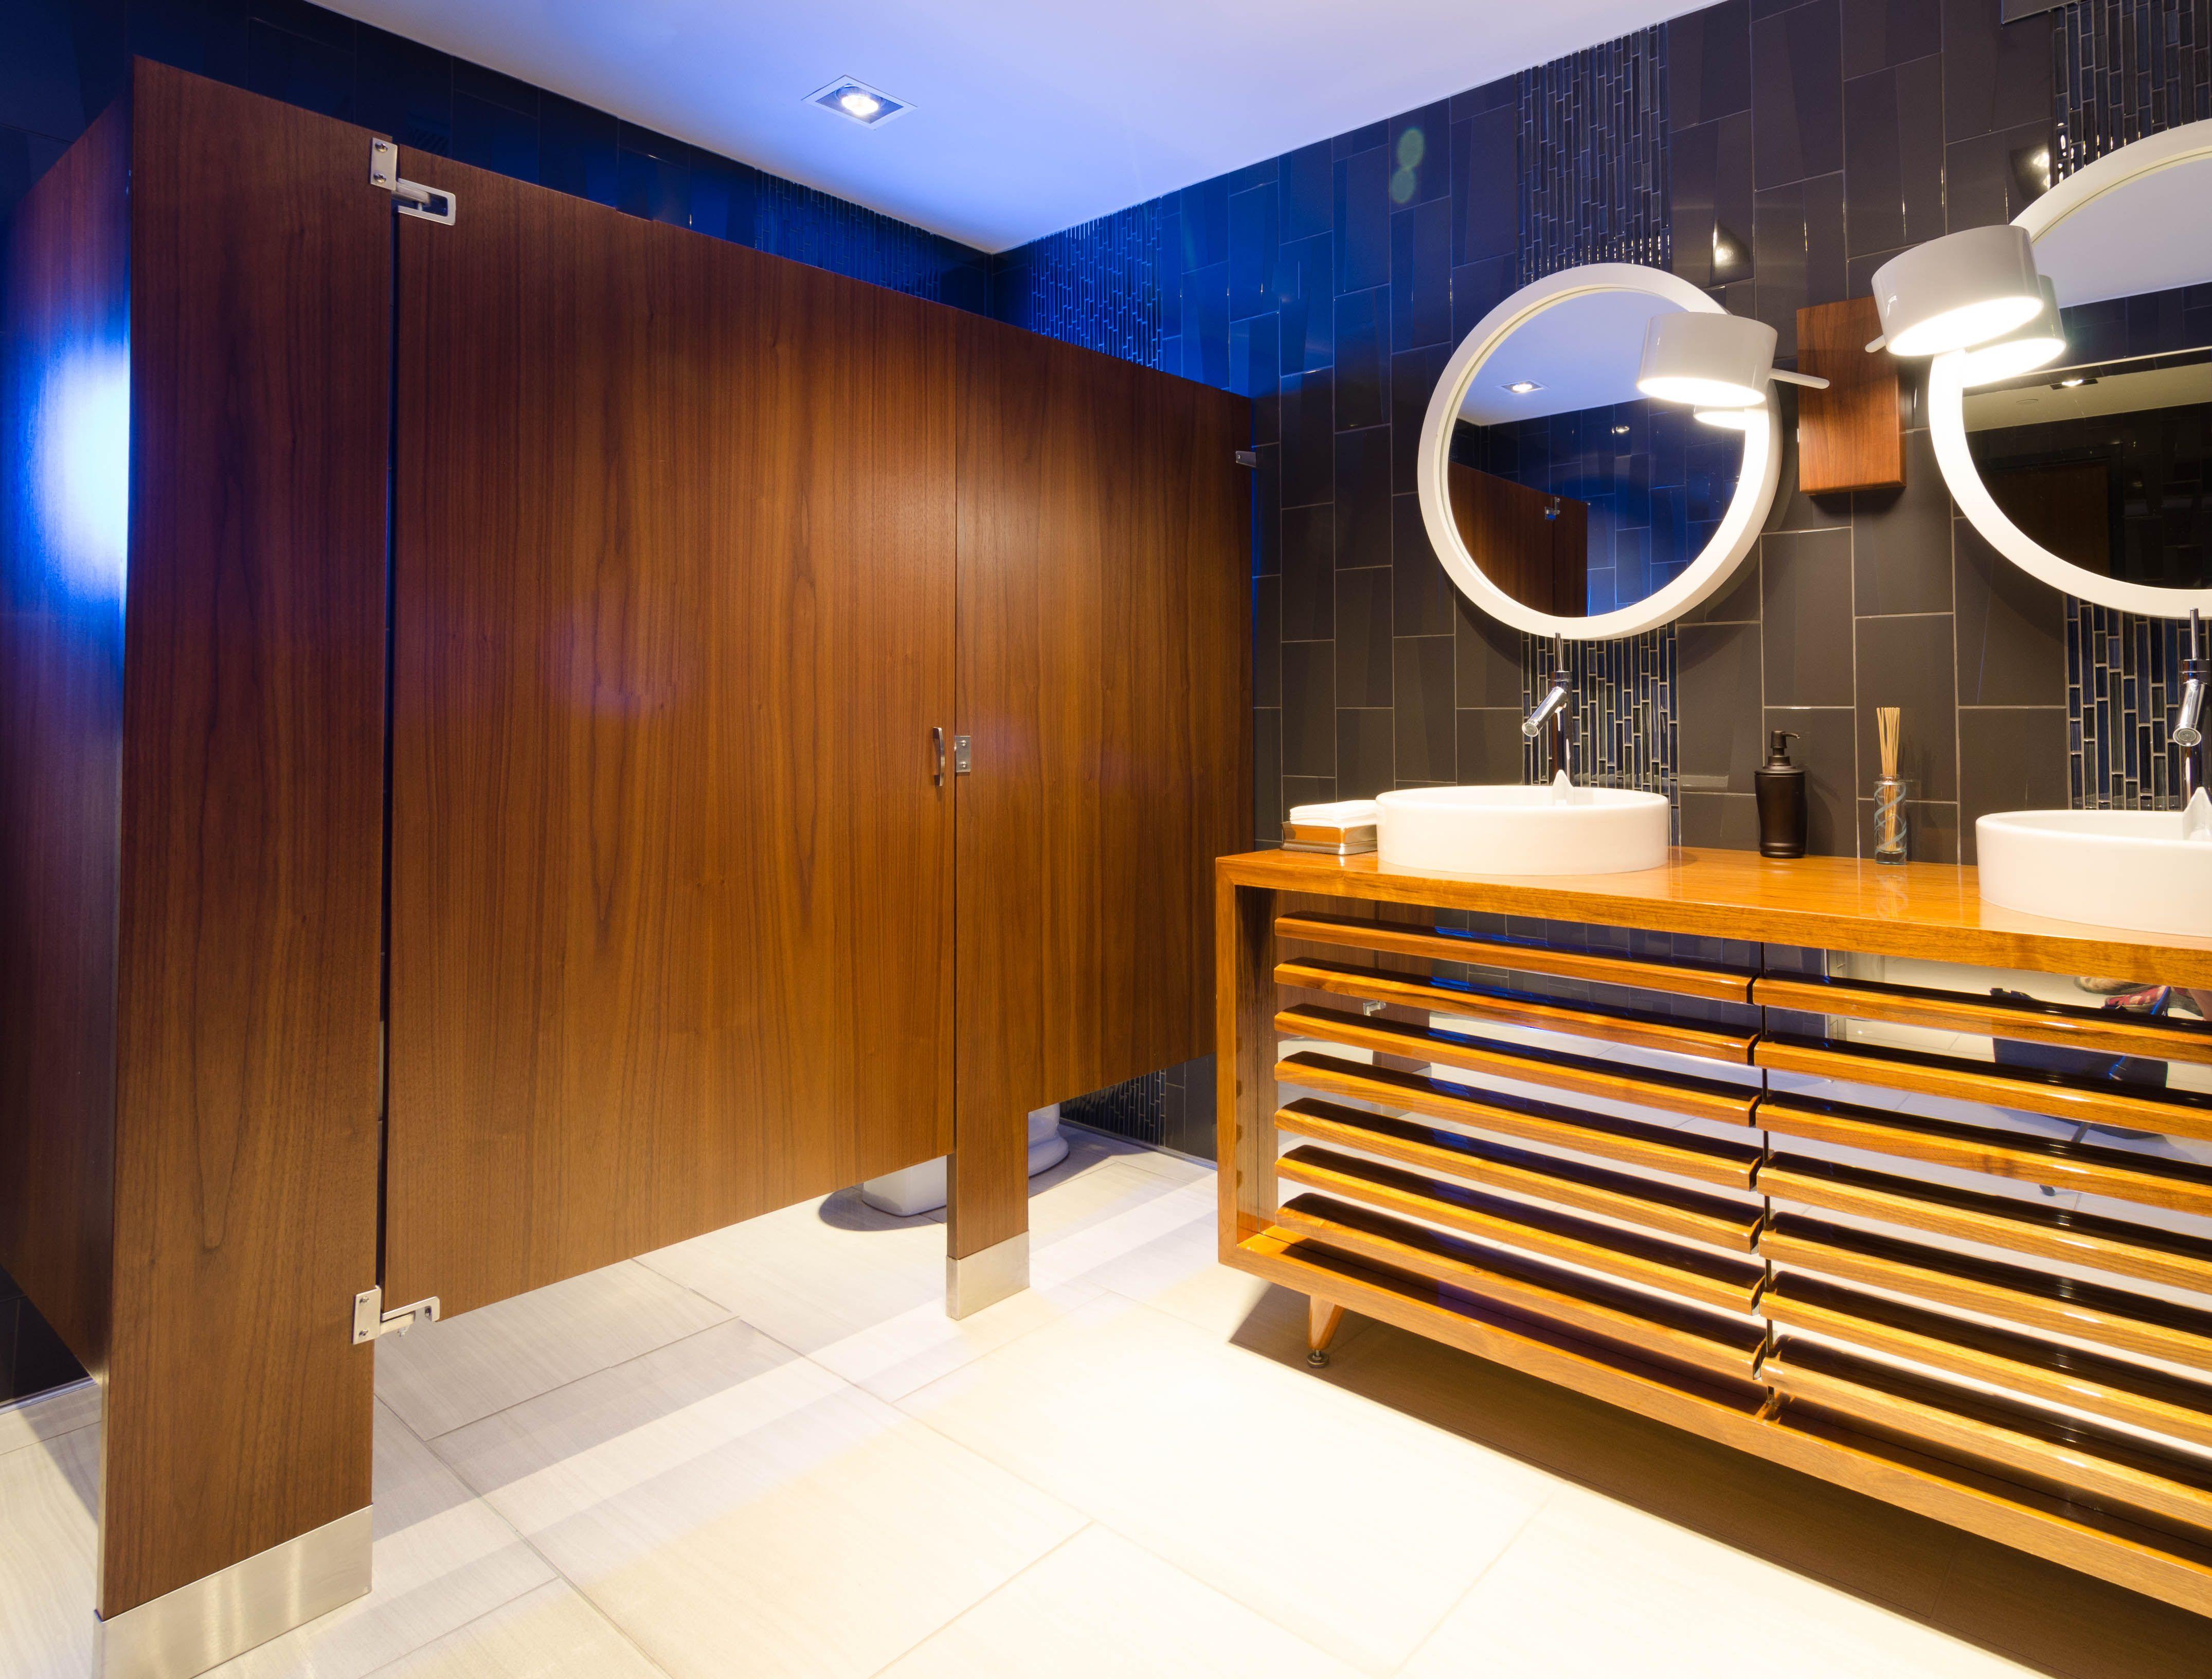 Ironwood Manufacturing wood veneer toilet partition and bathroom doors. Beautiful upscale public restroom stalls & Ironwood Manufacturing wood veneer toilet partition and bathroom ... pezcame.com